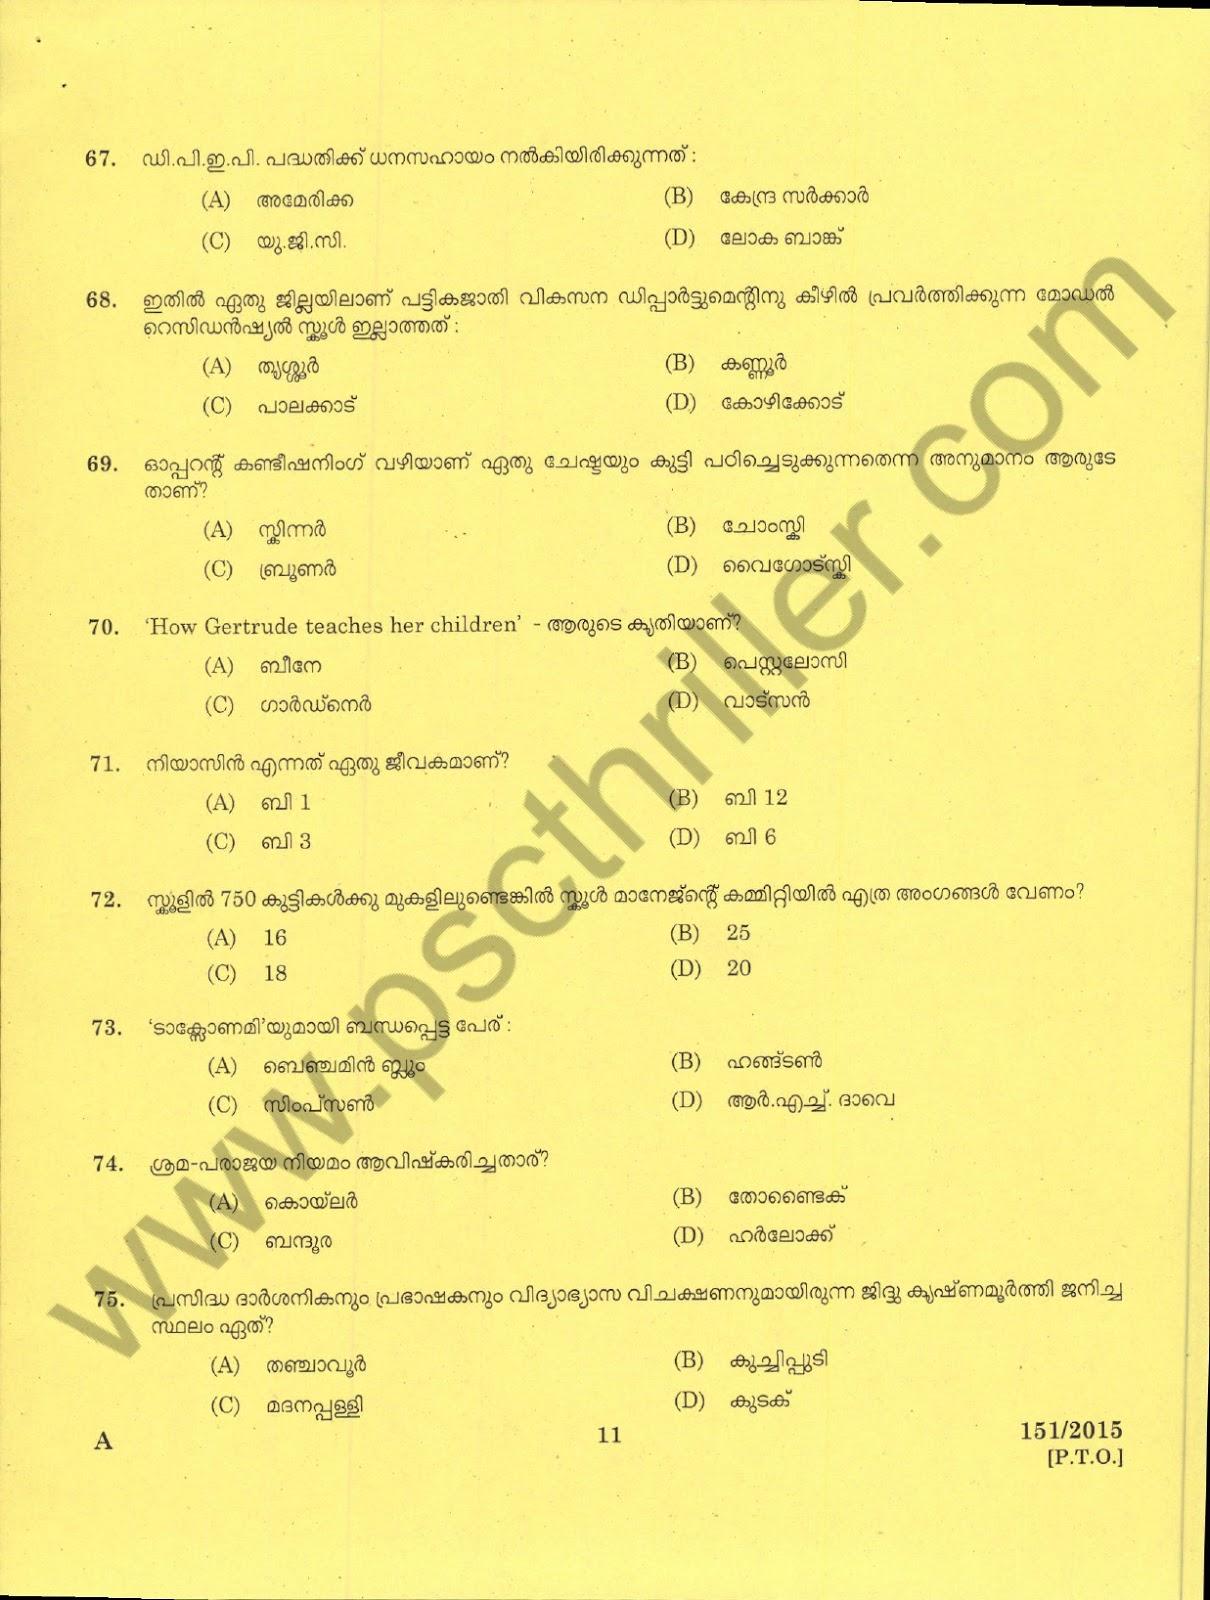 PSC THRILLER: Nursery School Teacher- Question Paper with